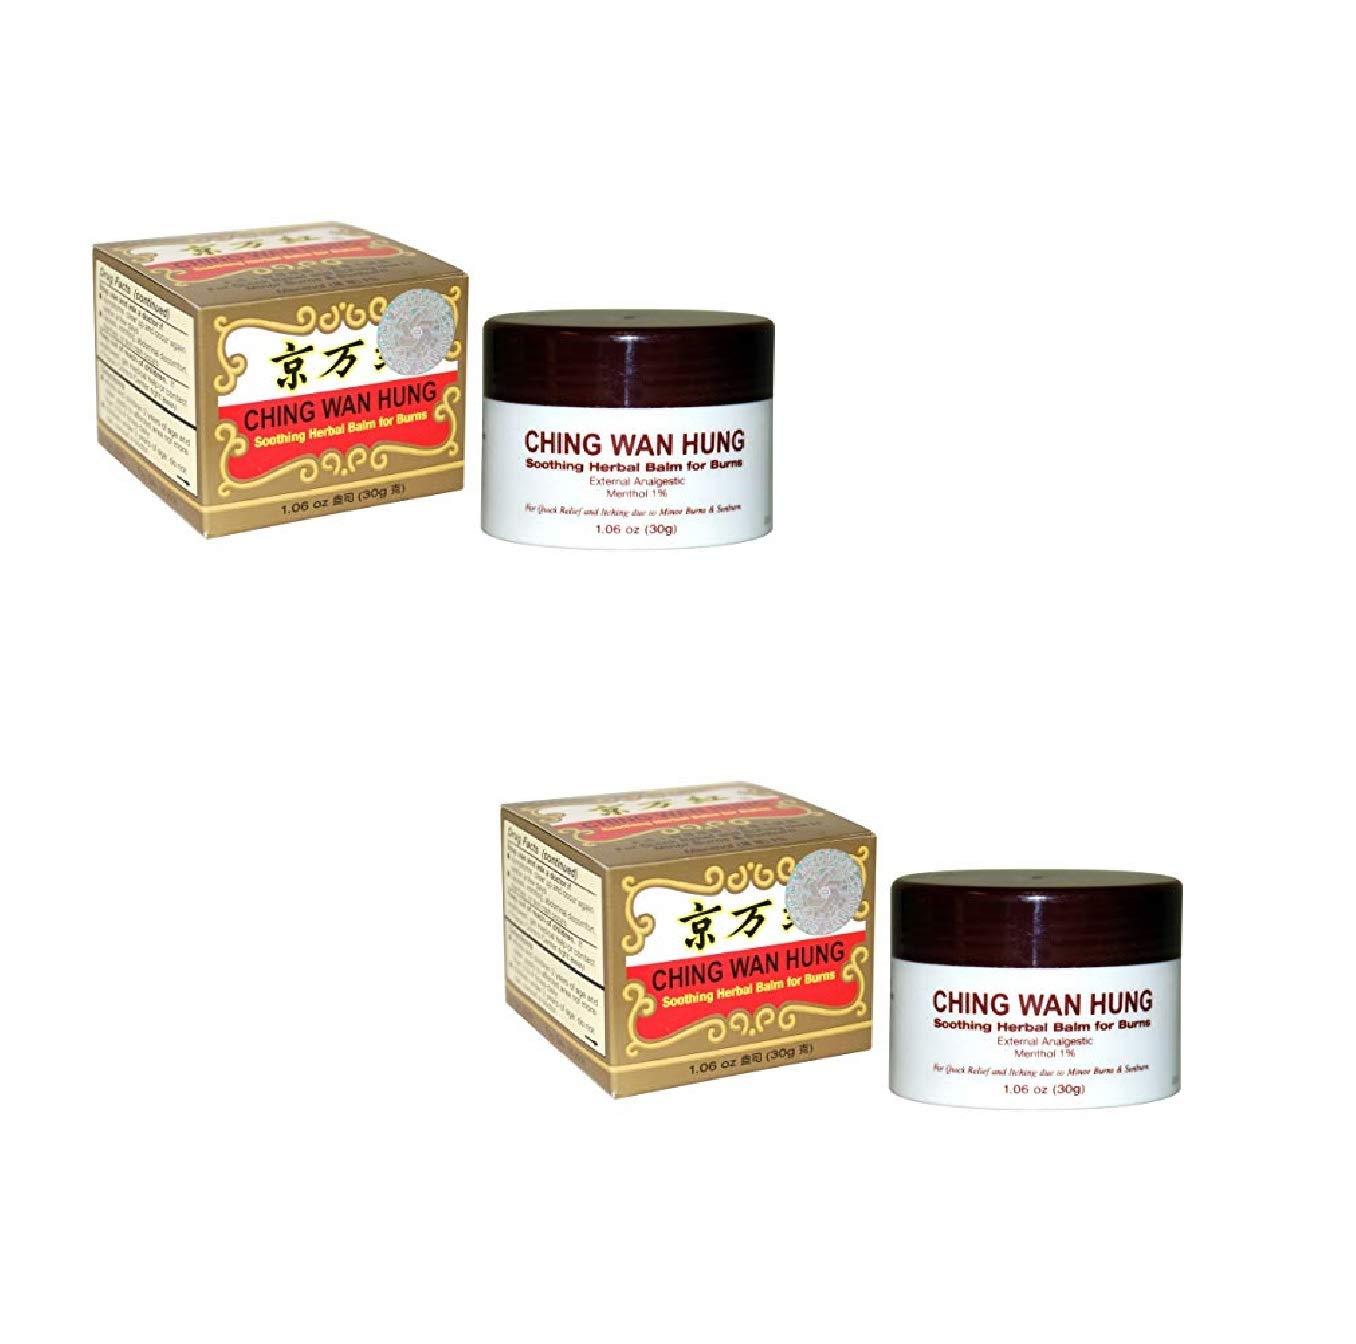 Ching WAN Hung - Soothing Herbal Balm (1.06 Oz/30 Gram) (2 Pack)